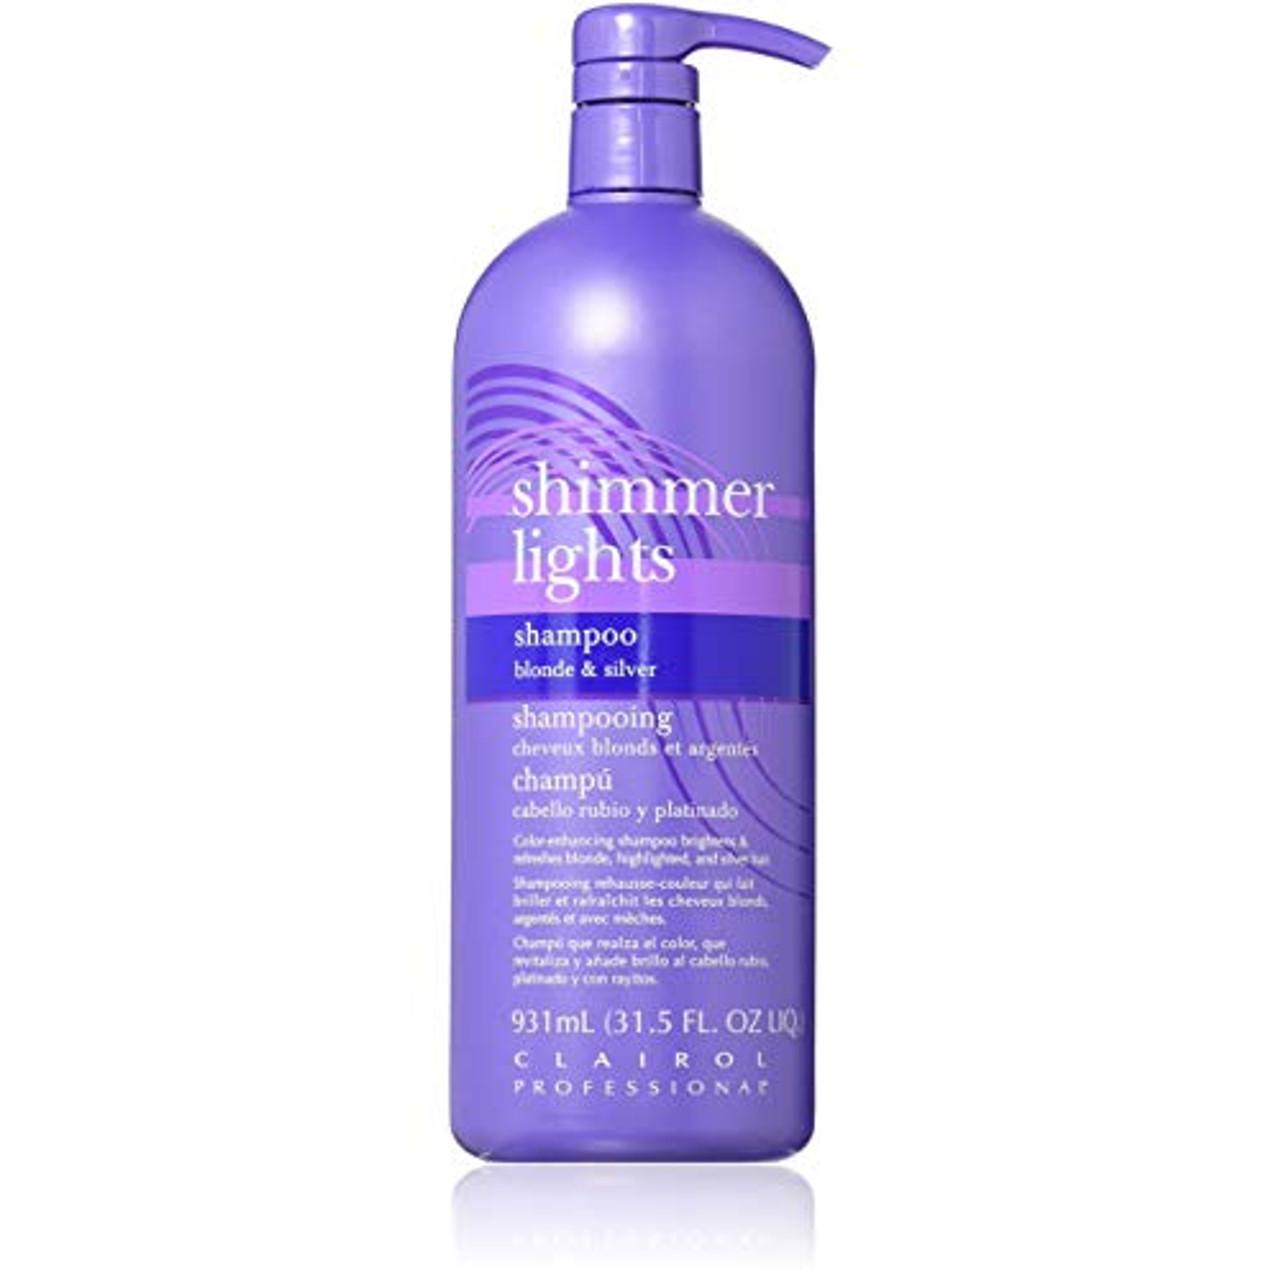 Clairol Shimmer Light Shampoo 32 oz